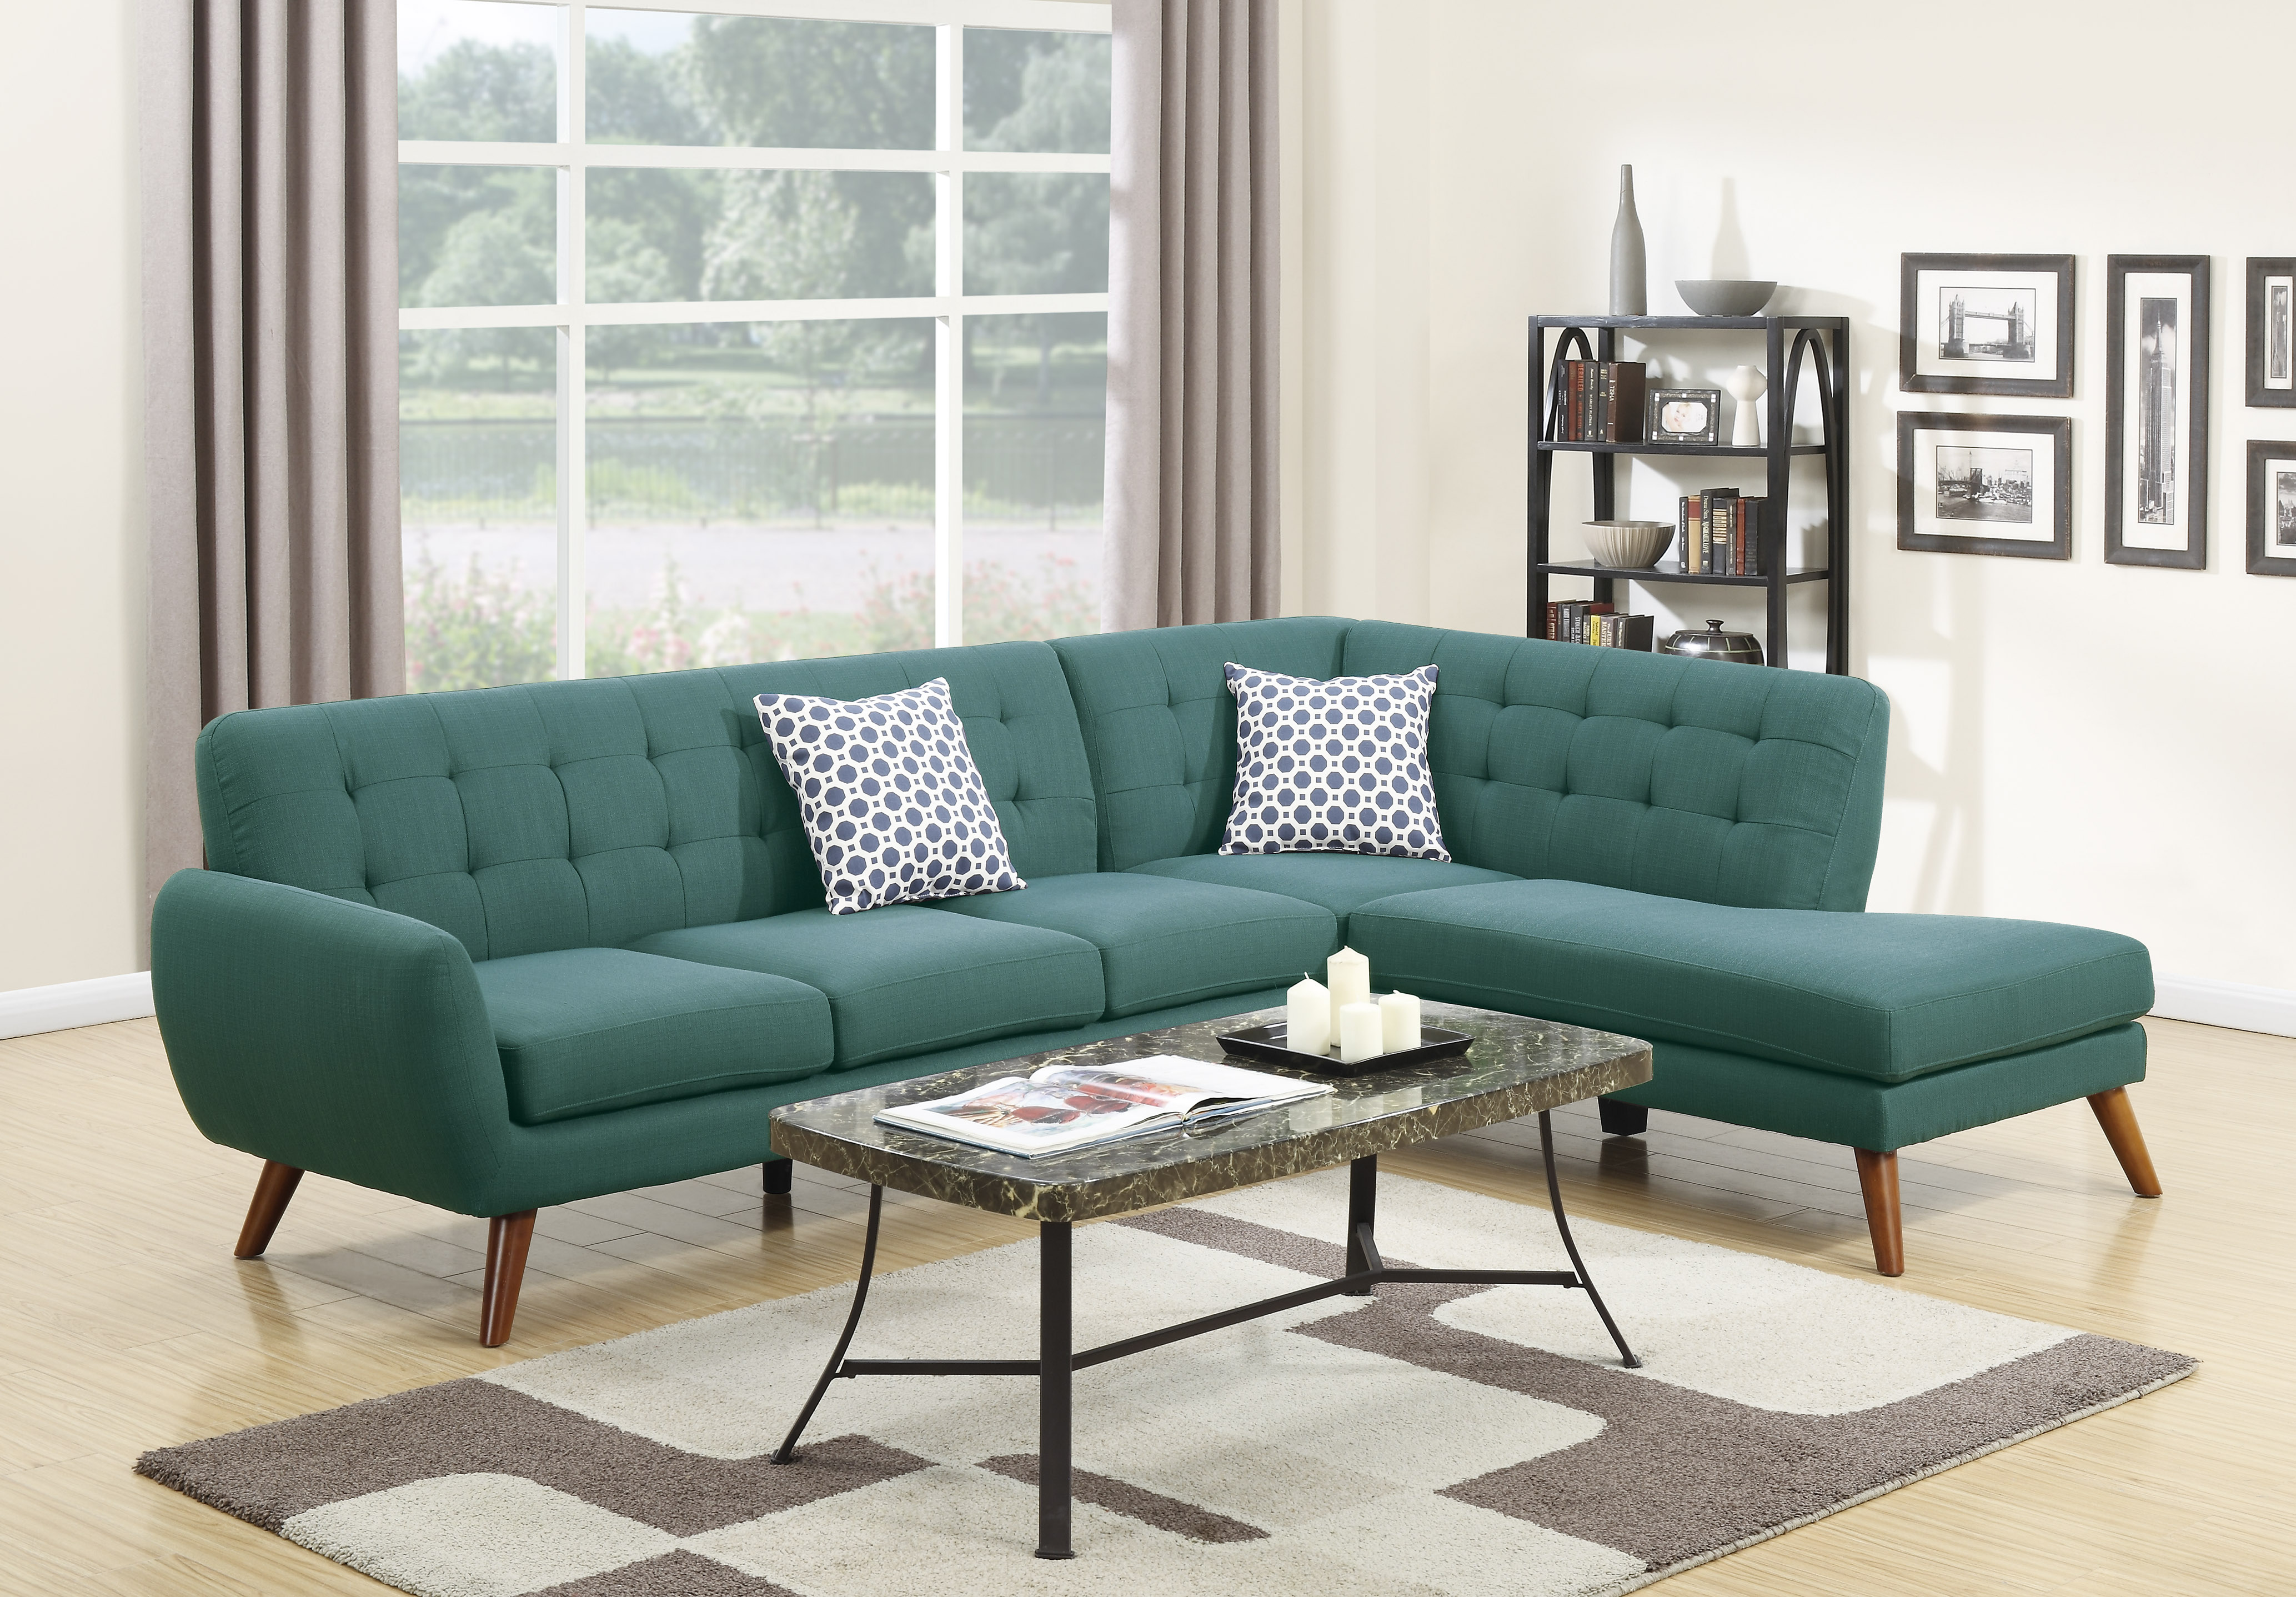 2Pcs Black Chocolate Blue Grey Polyfiber Reversible Sectional Sofa Set